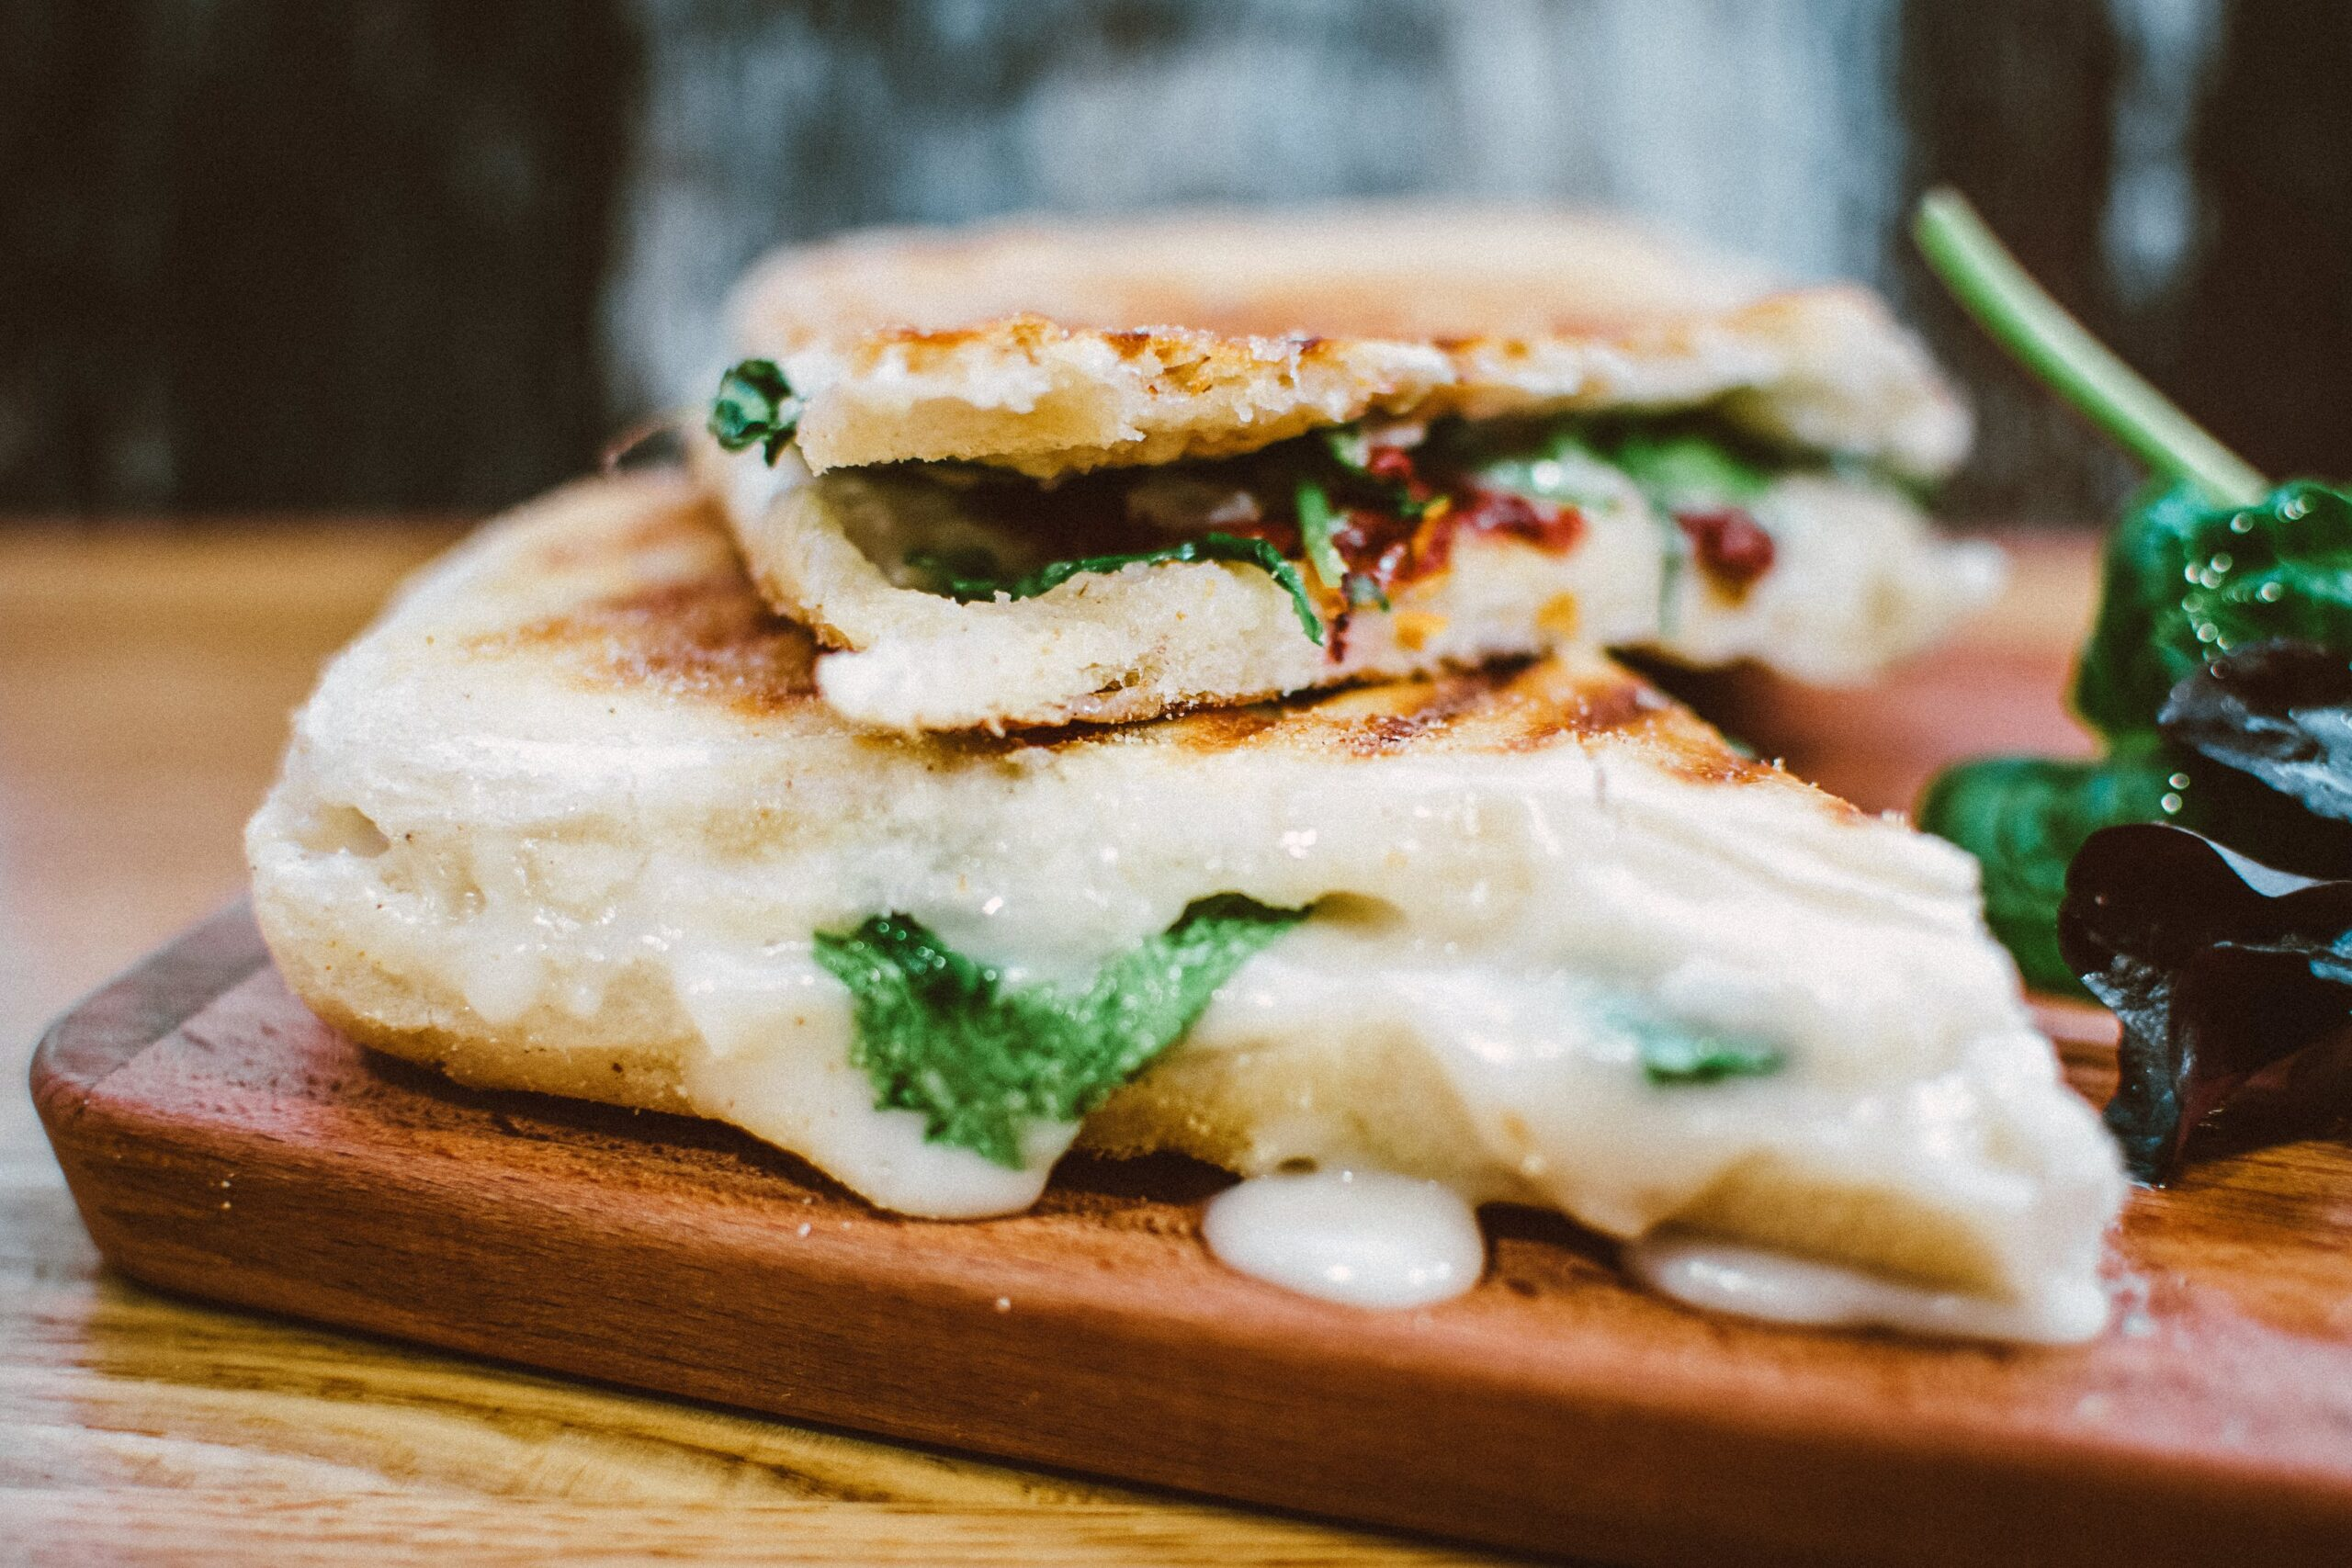 How to microwave Starbucks panini